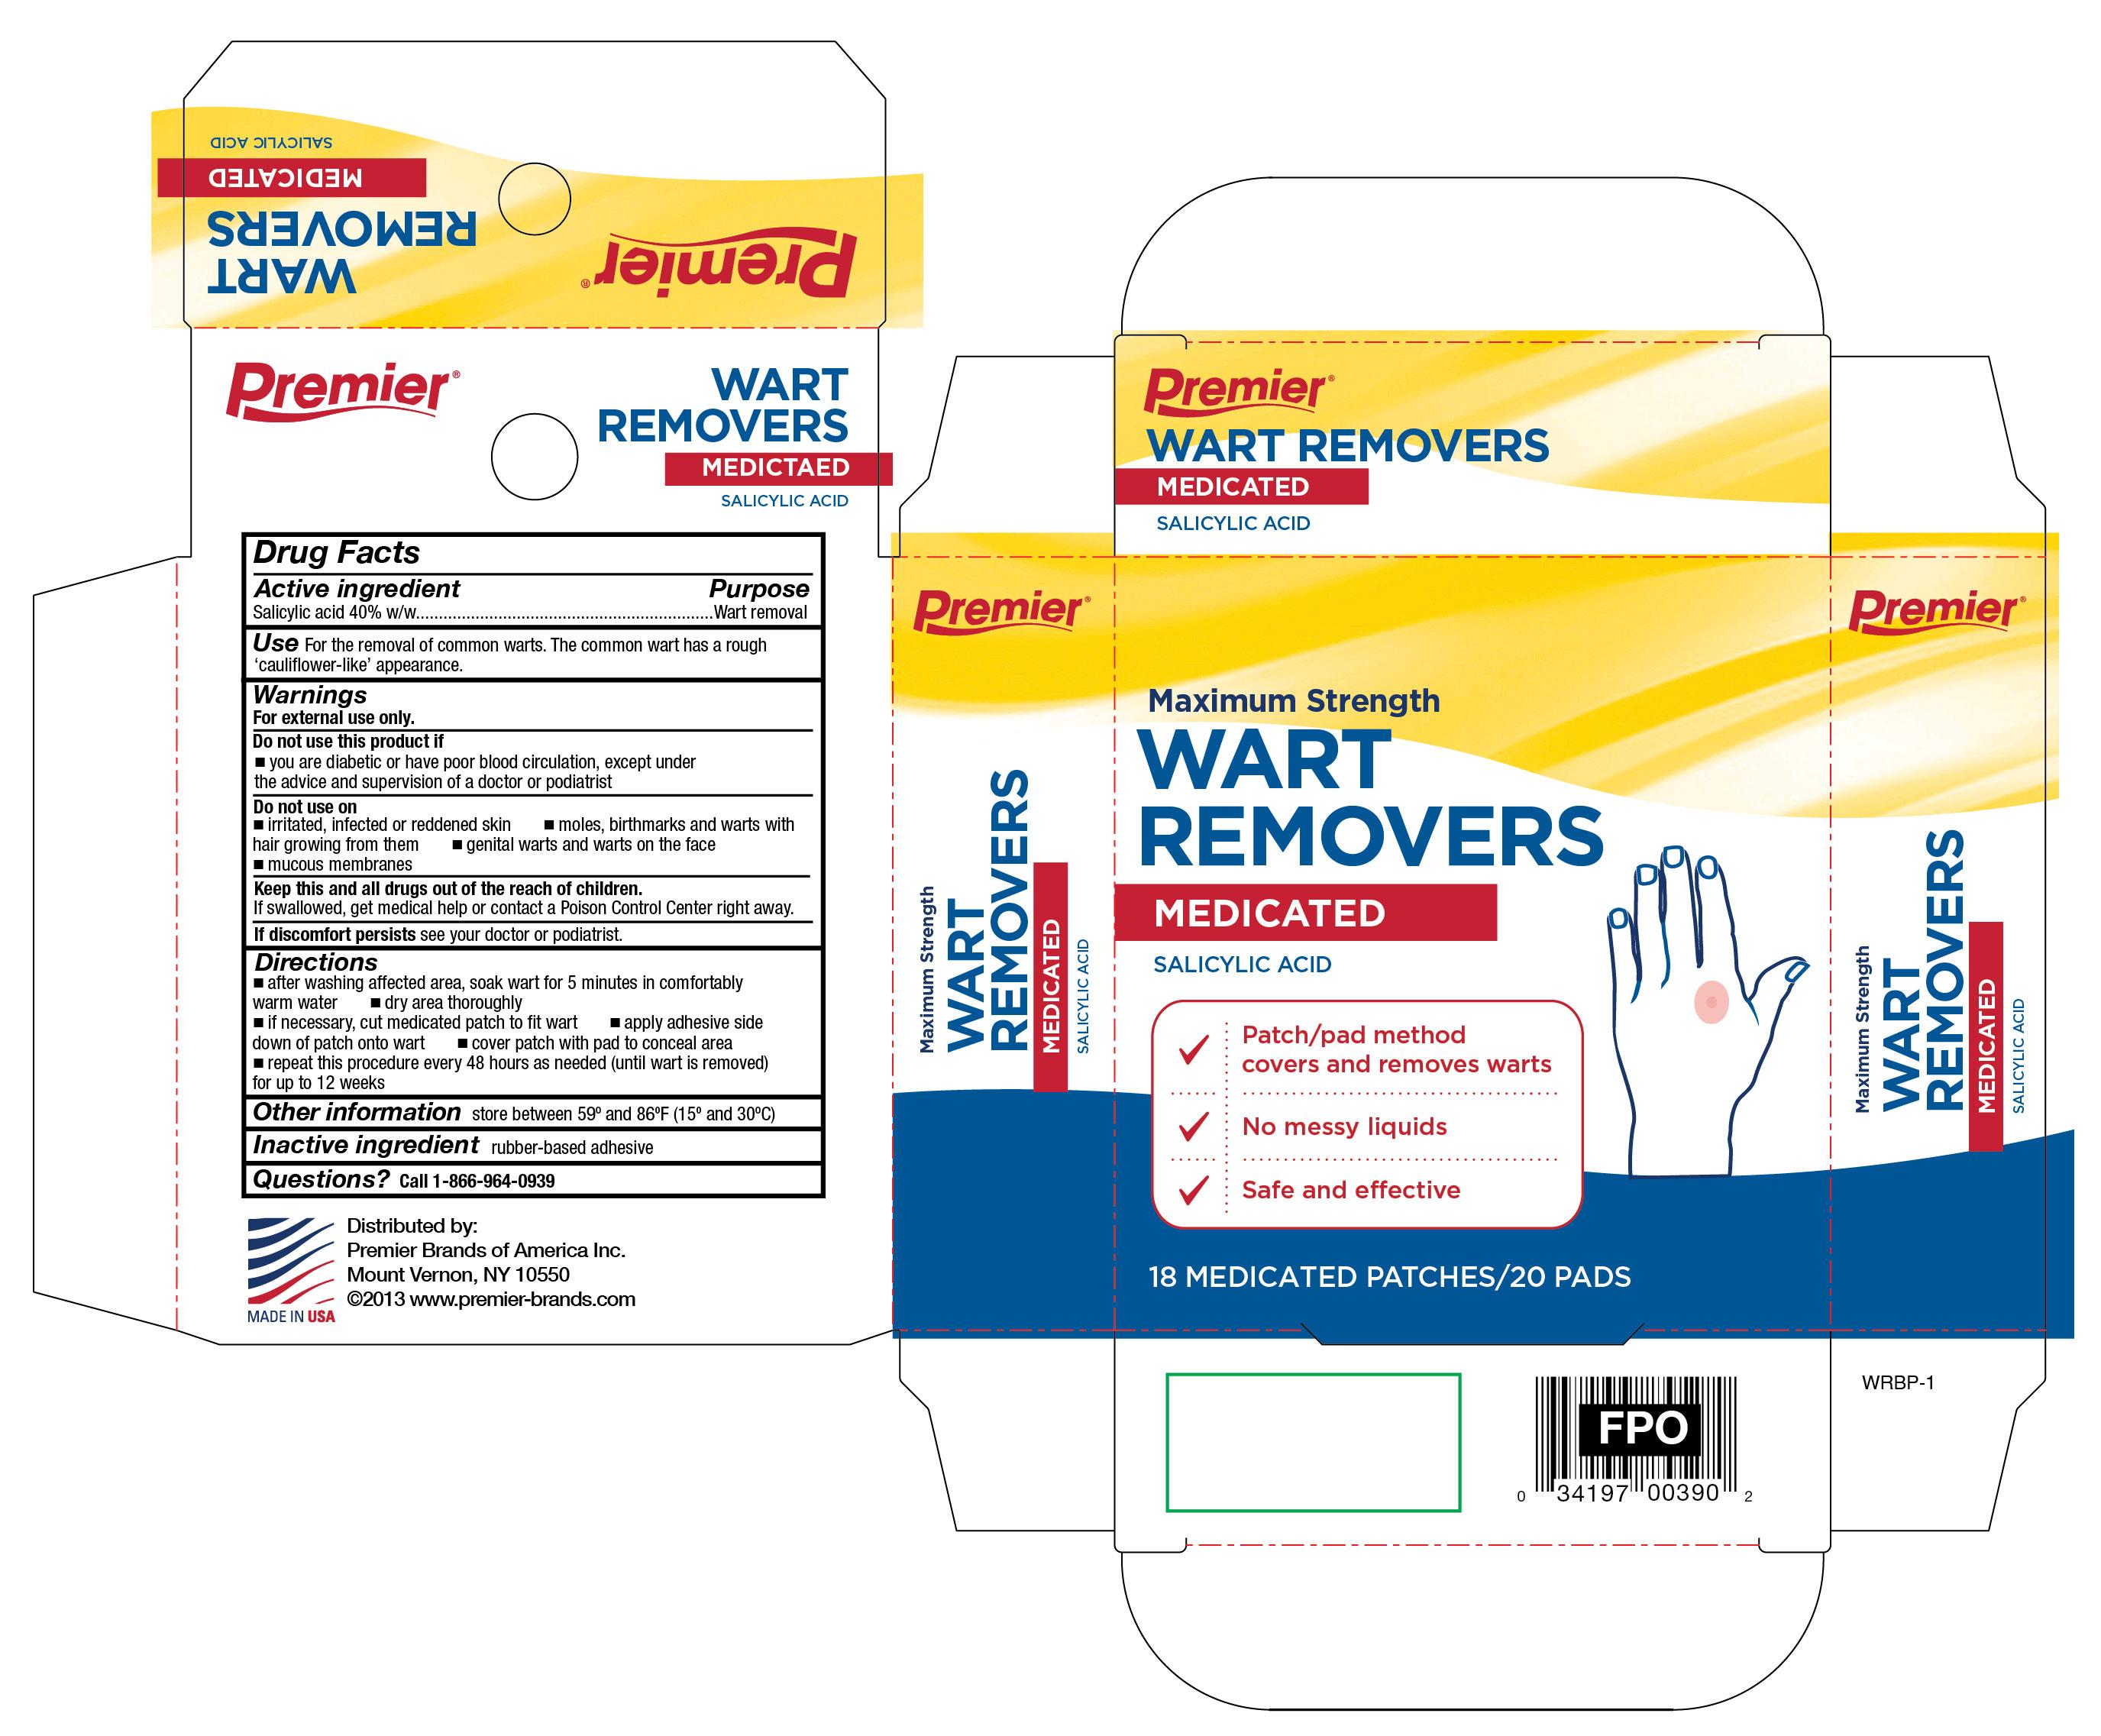 PREMIER_Wart Remover_BOX_WRBP-1-01.jpg